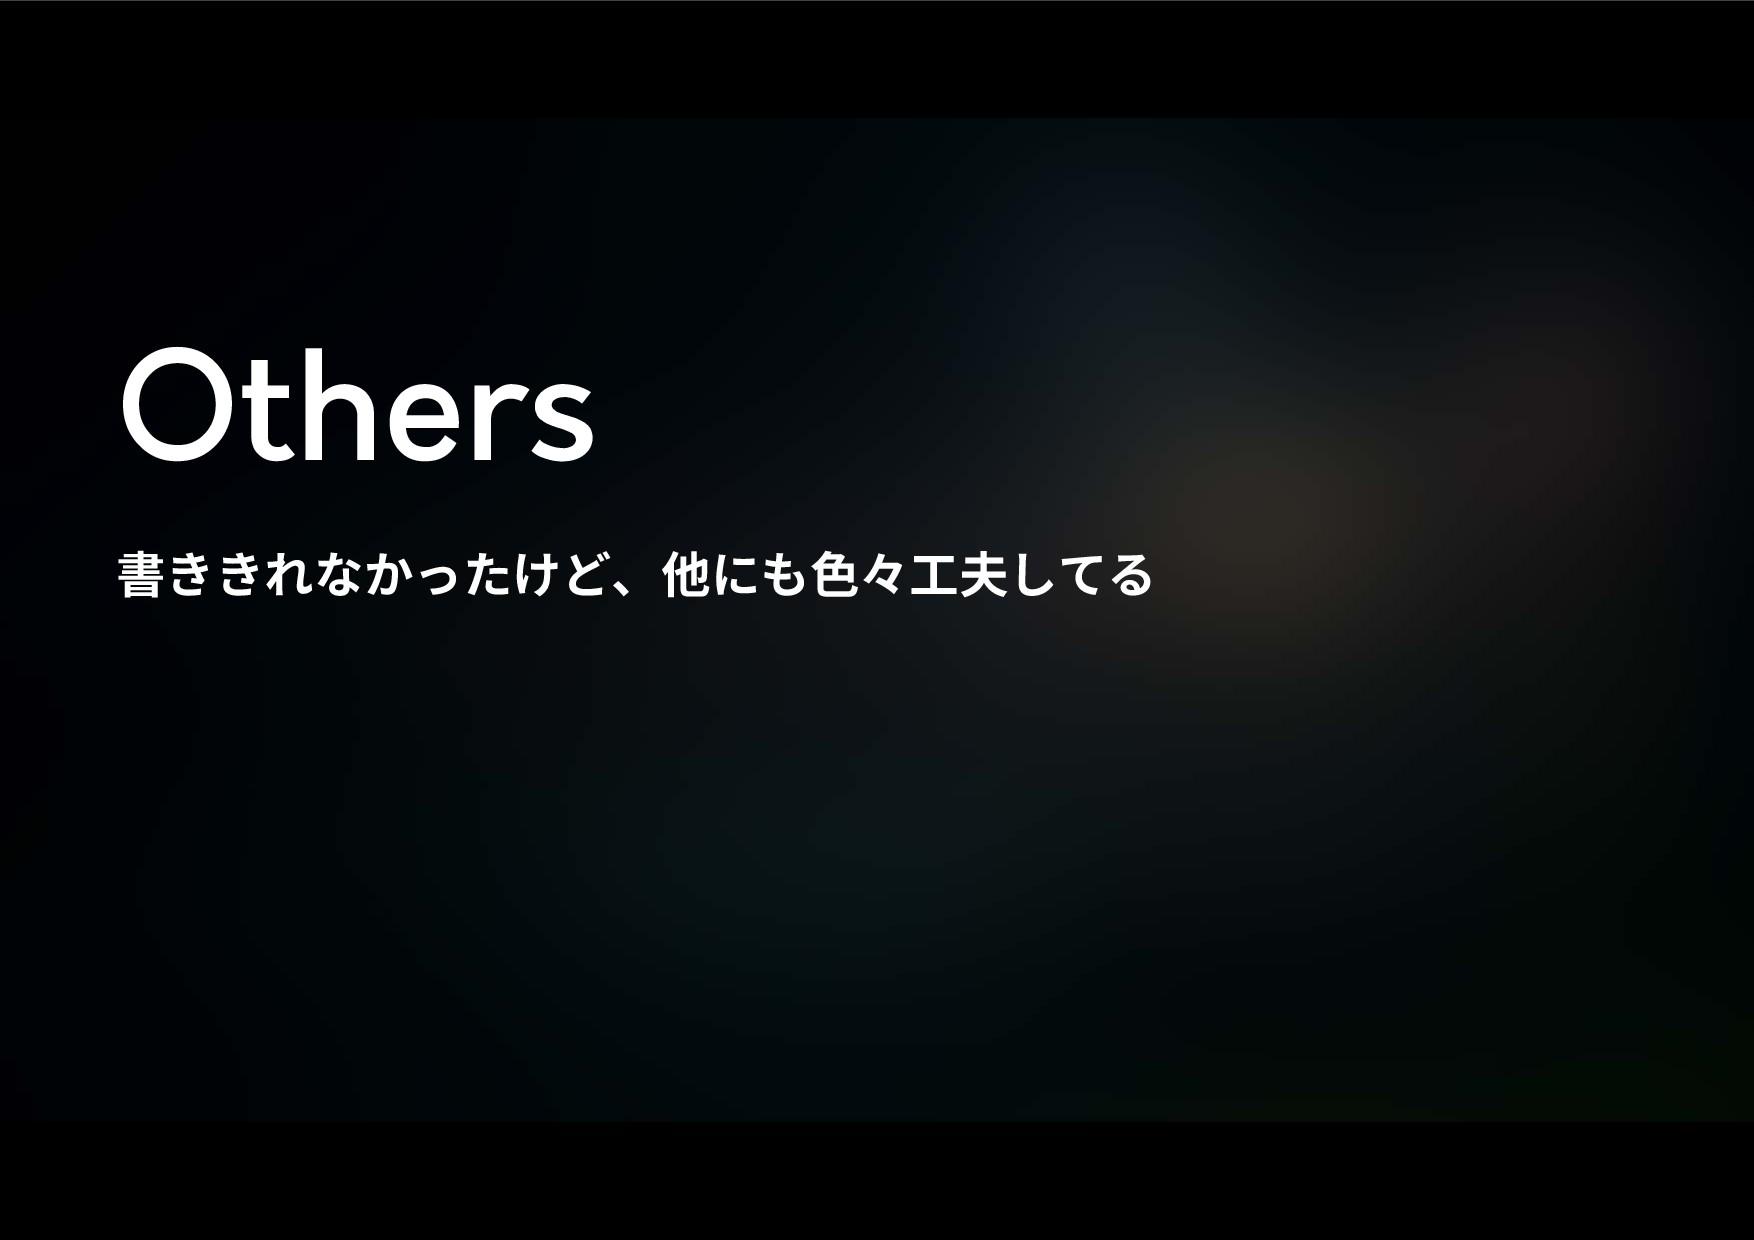 Others 剅ֹֹזַֽוծ➭ח葿ղ䊨㣗׃ג